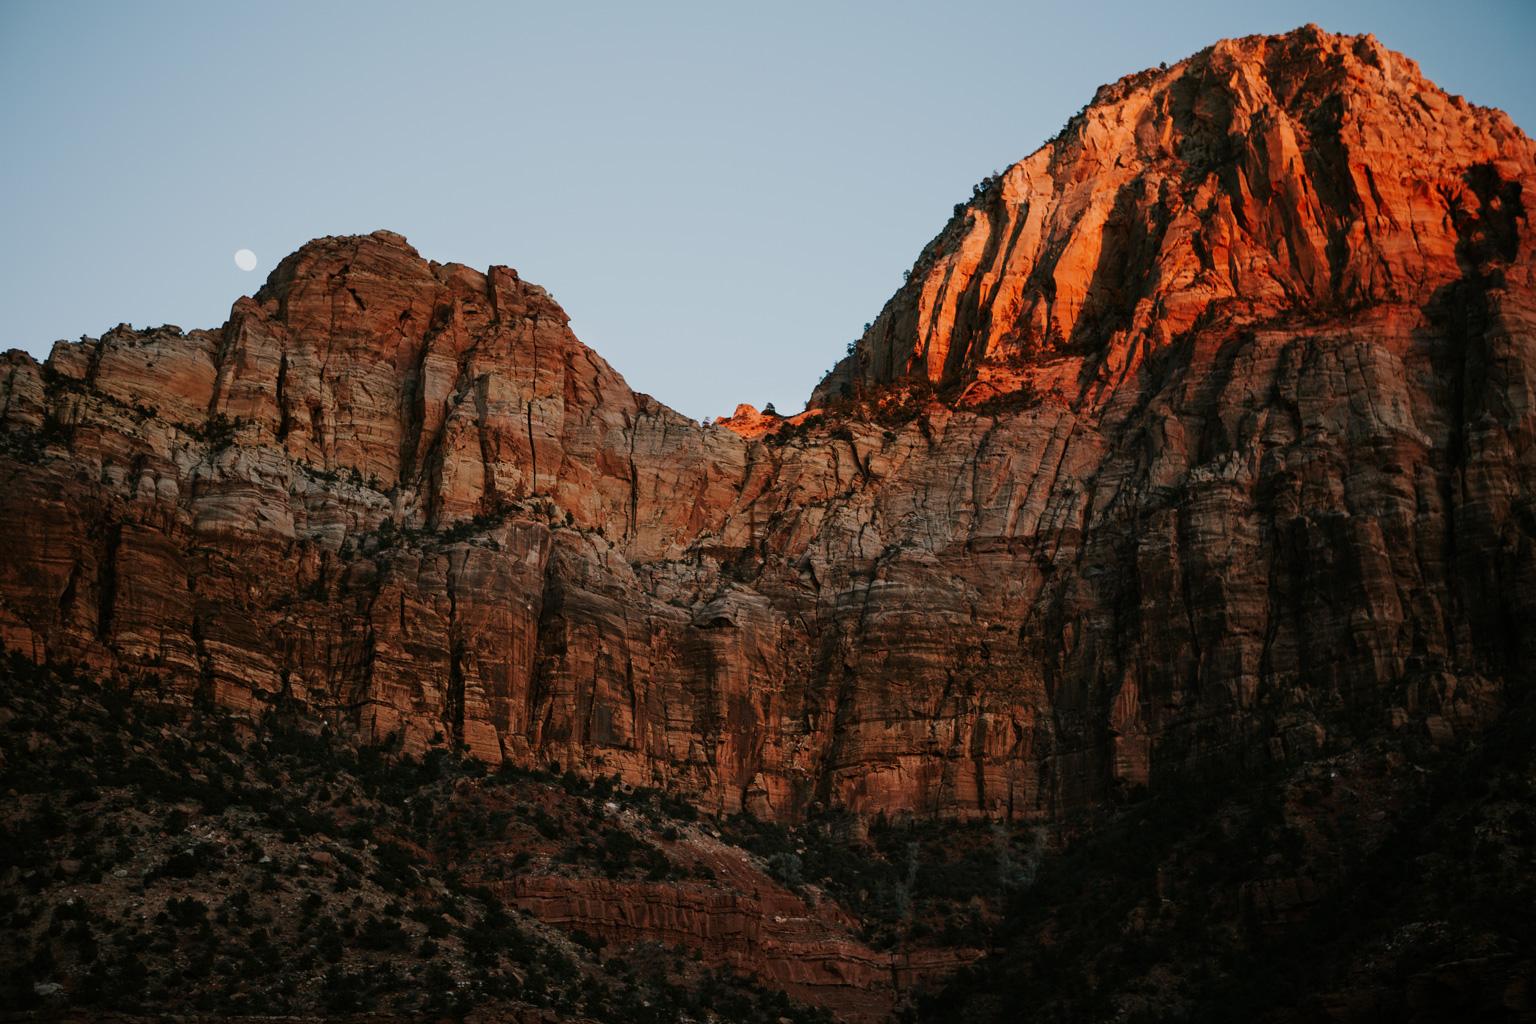 CindyGiovagnoli_Utah_Zion_desert_night_morning_coffee_blm_land_off_grid-002.jpg